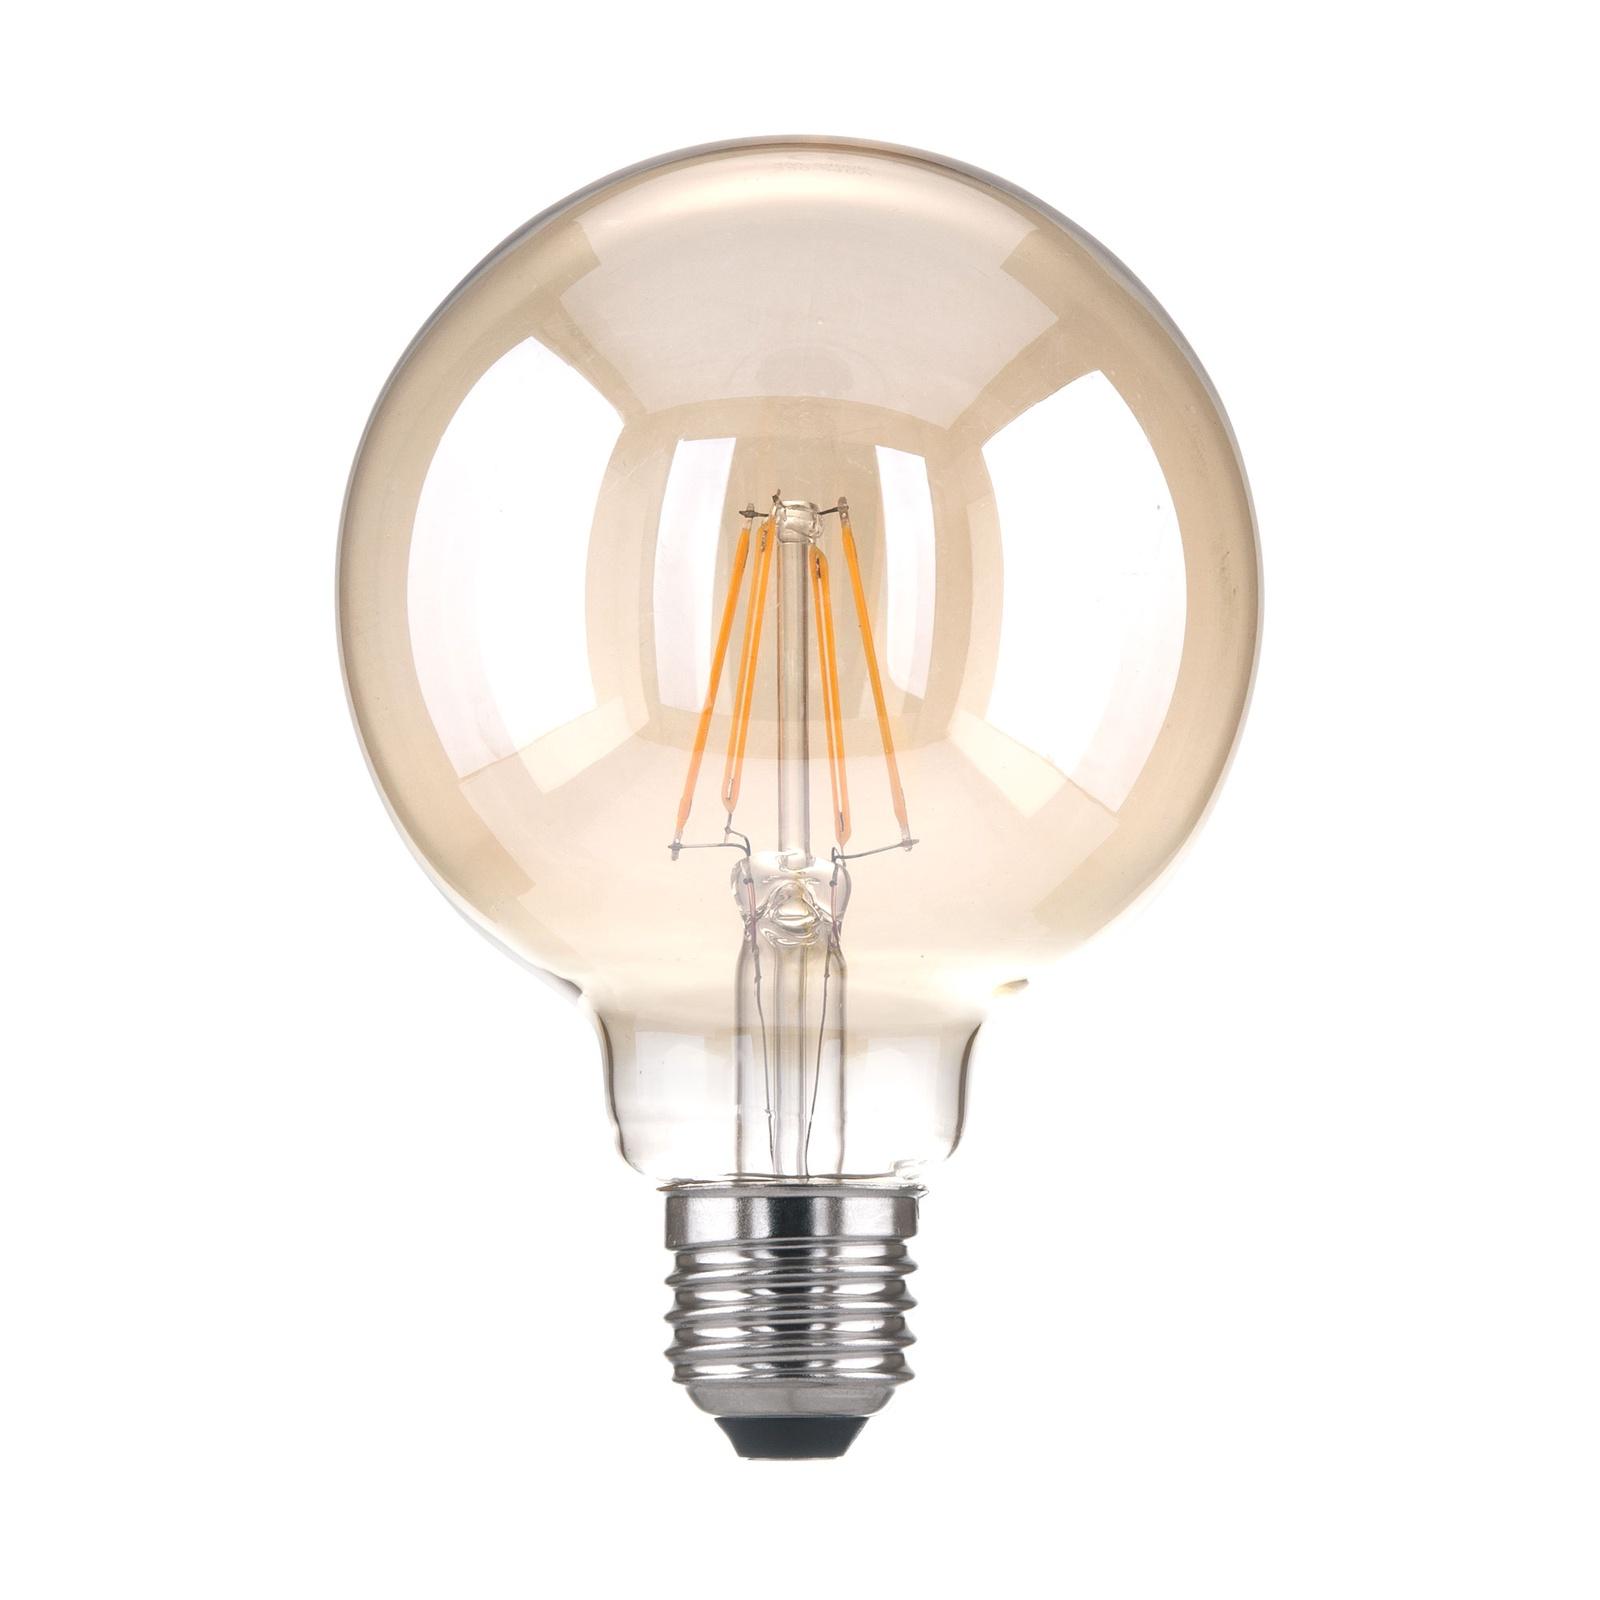 Лампочка Elektrostandard светодиодная Classic F 6W 3300K E27, Теплый свет 6 Вт, Светодиодная